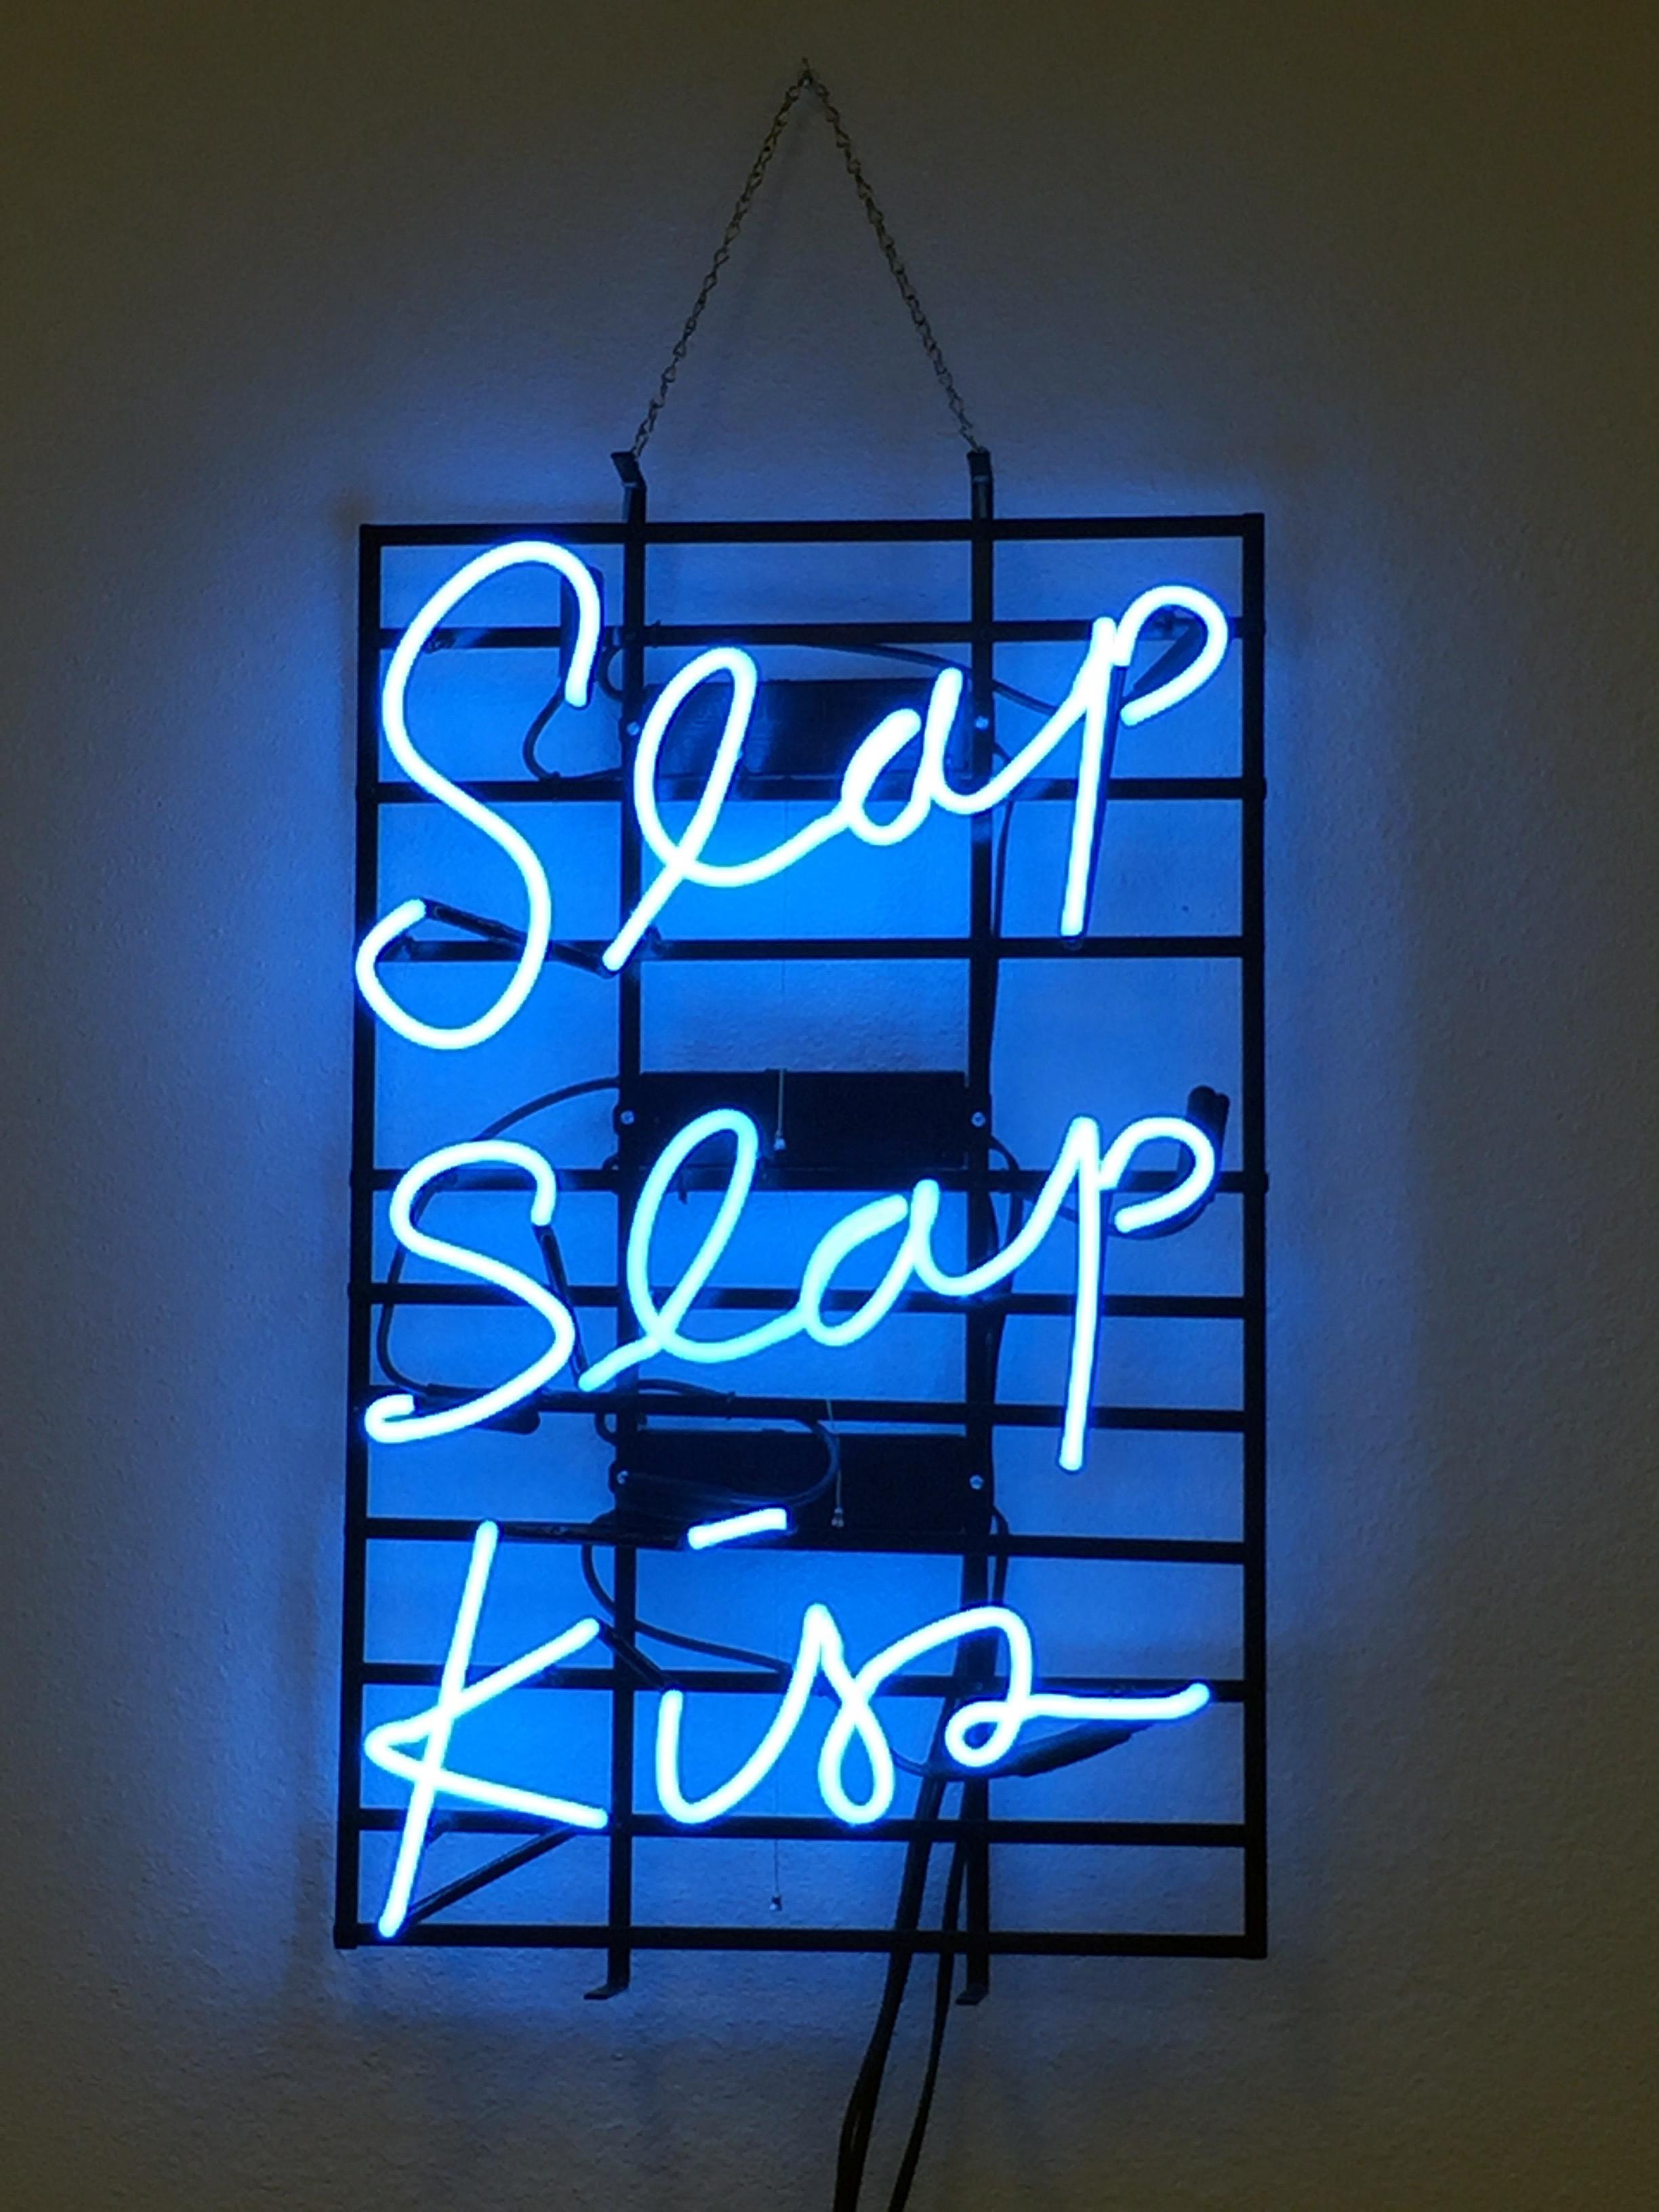 Allison Wiese_Slap Slap Kiss_Neon.jpg